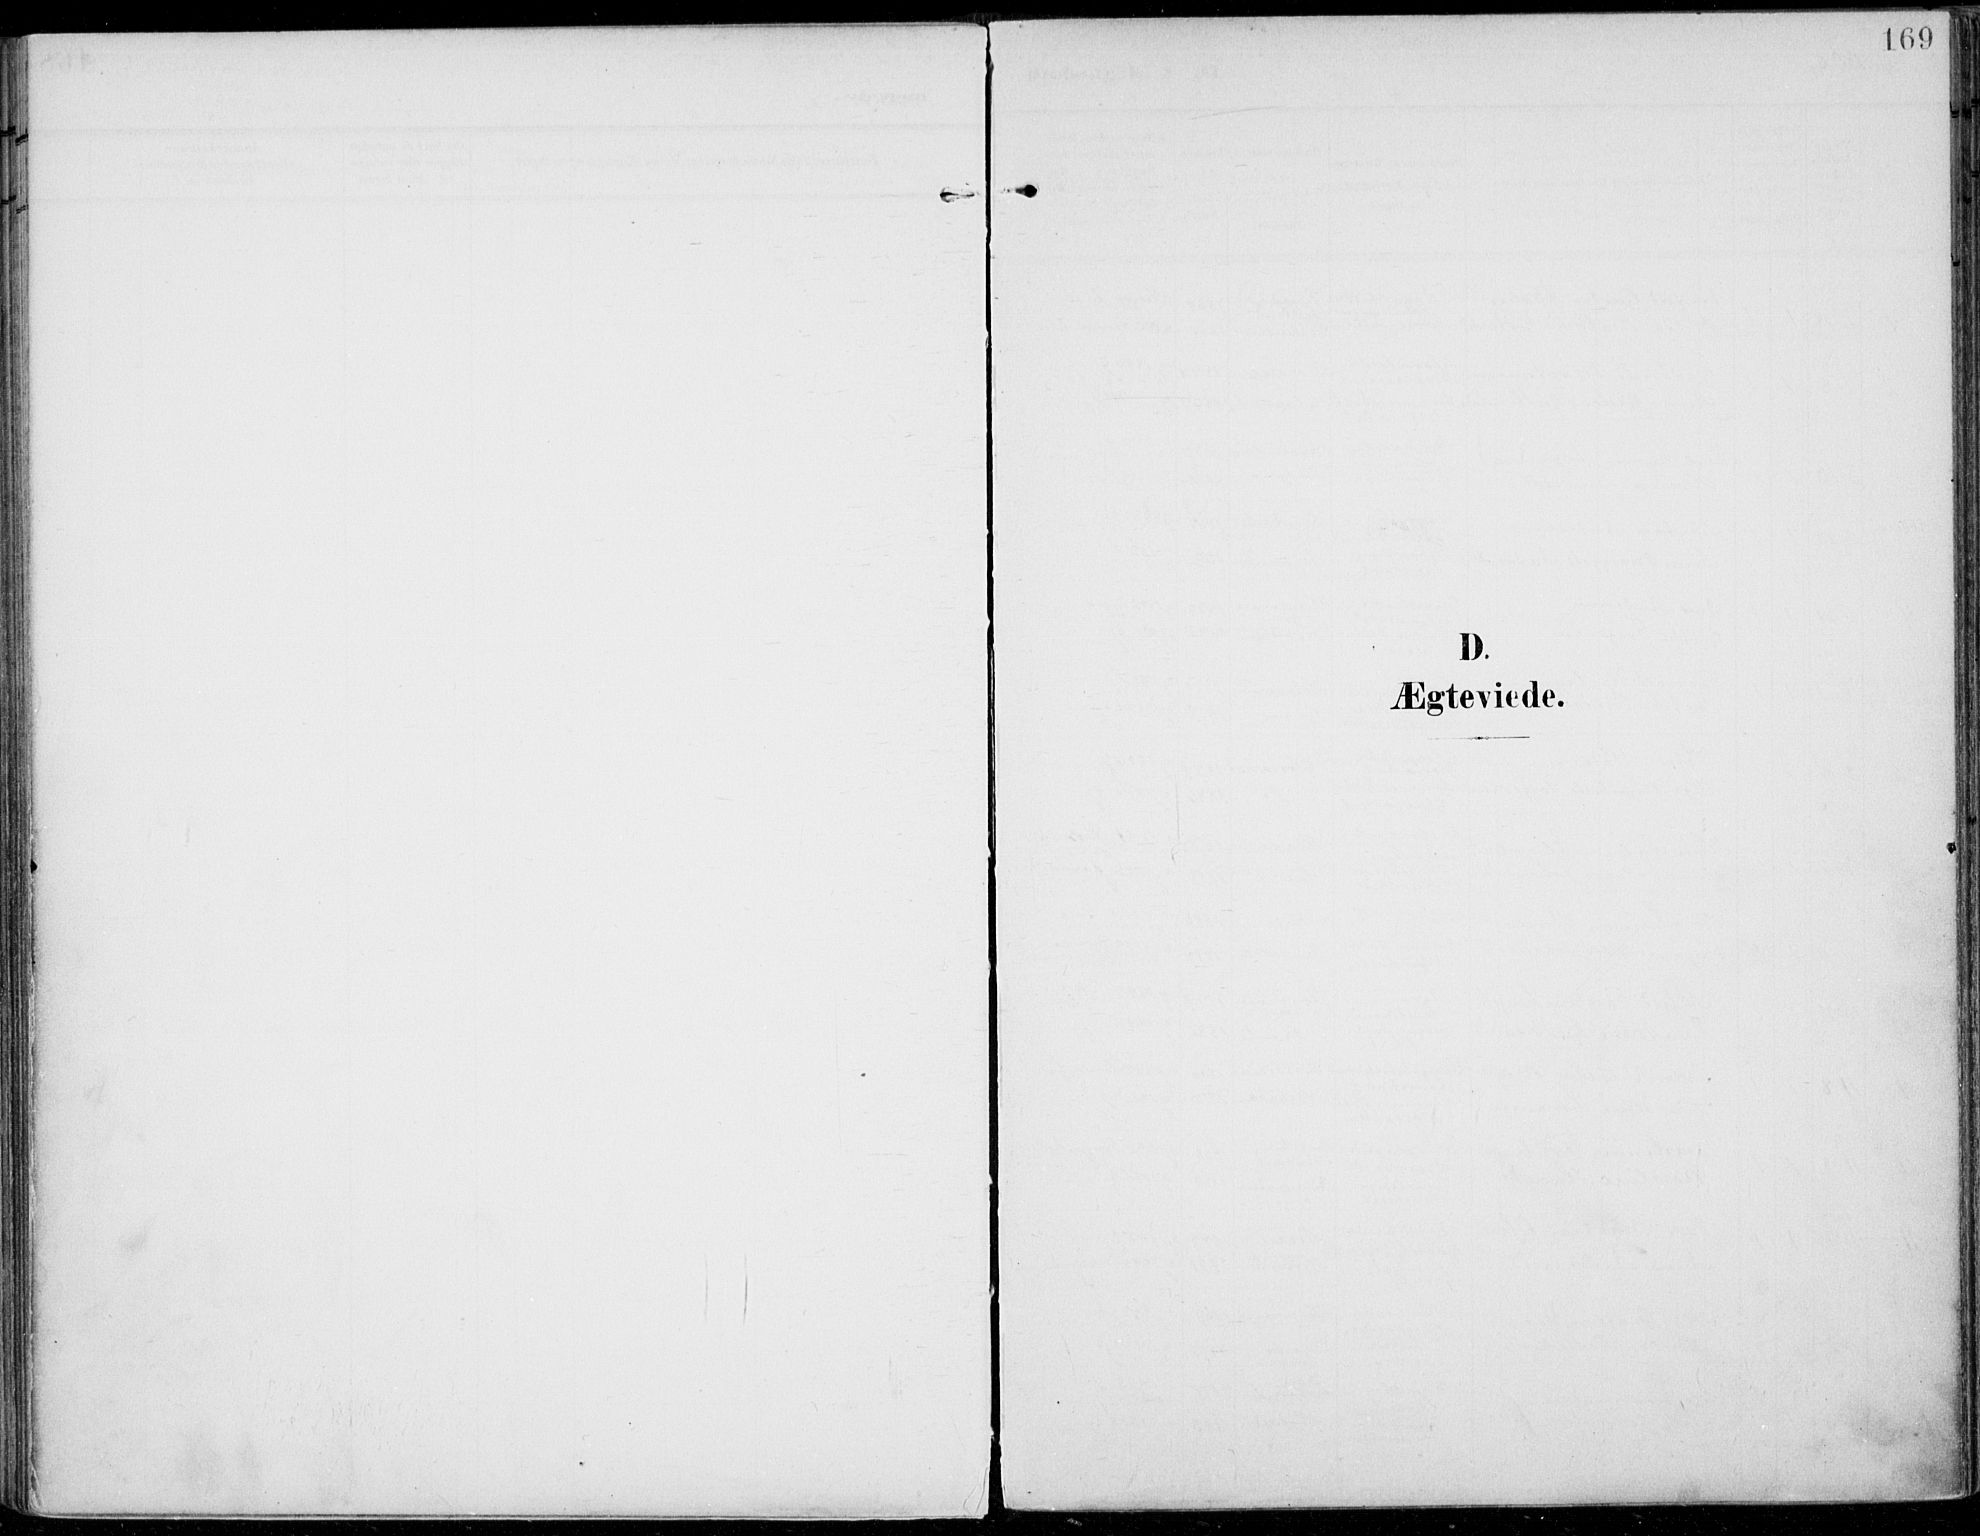 SAH, Jevnaker prestekontor, Ministerialbok nr. 11, 1902-1913, s. 169